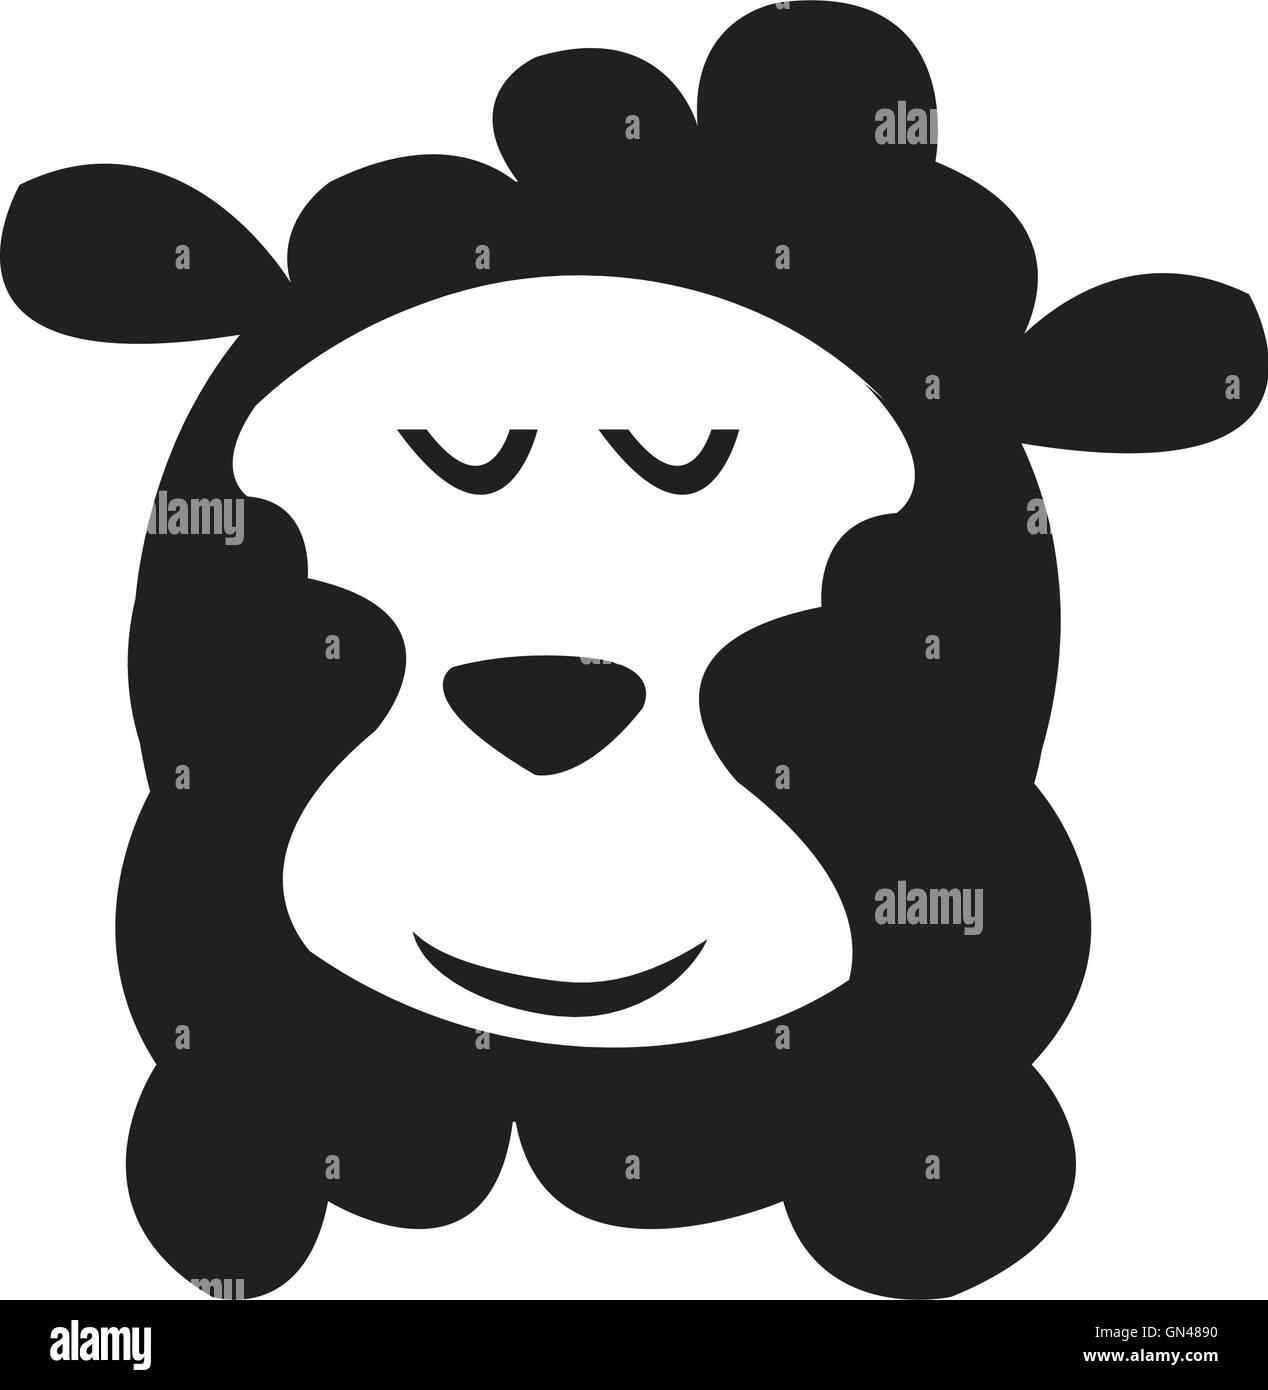 Vector. Isolated cartoon sheep head. - Stock Image